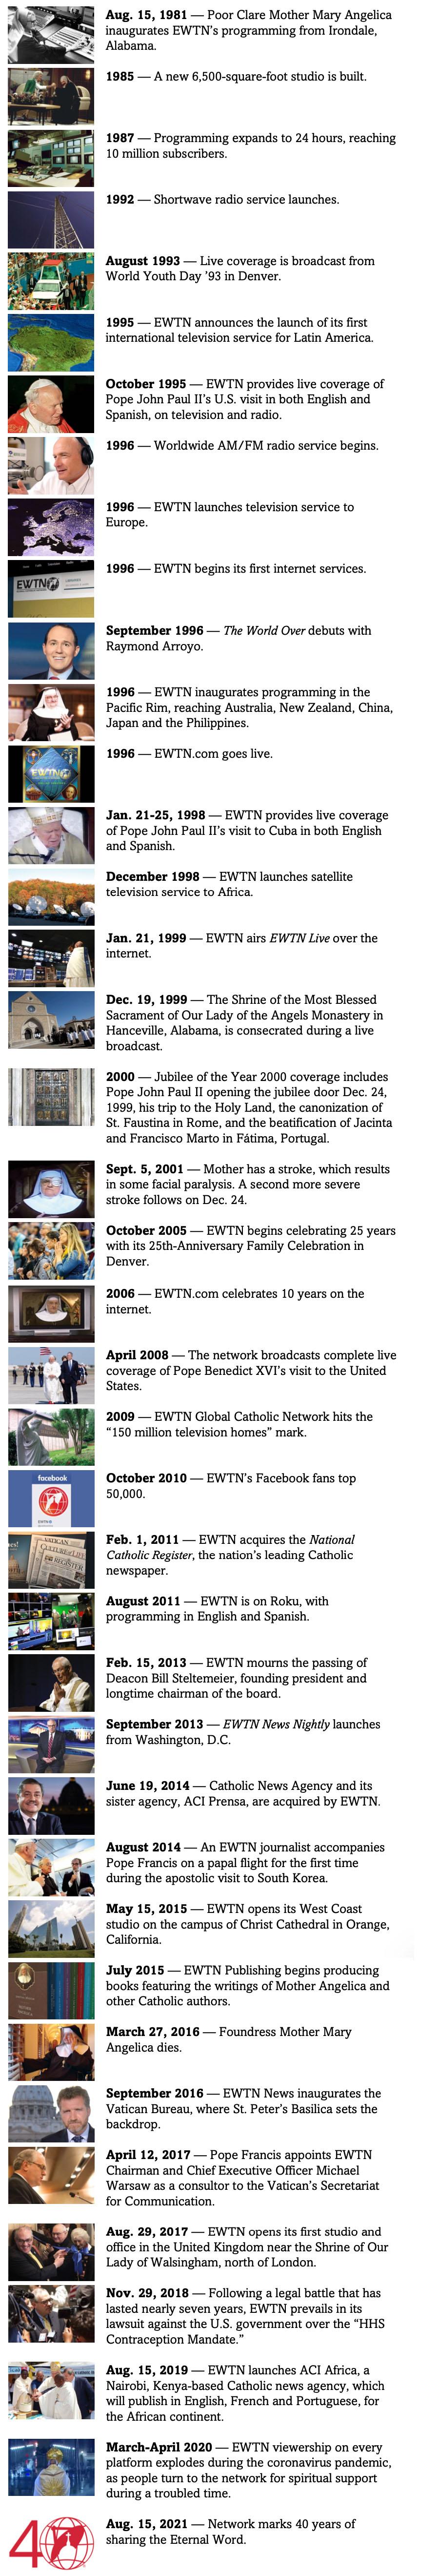 EWTN Timeline Version 2